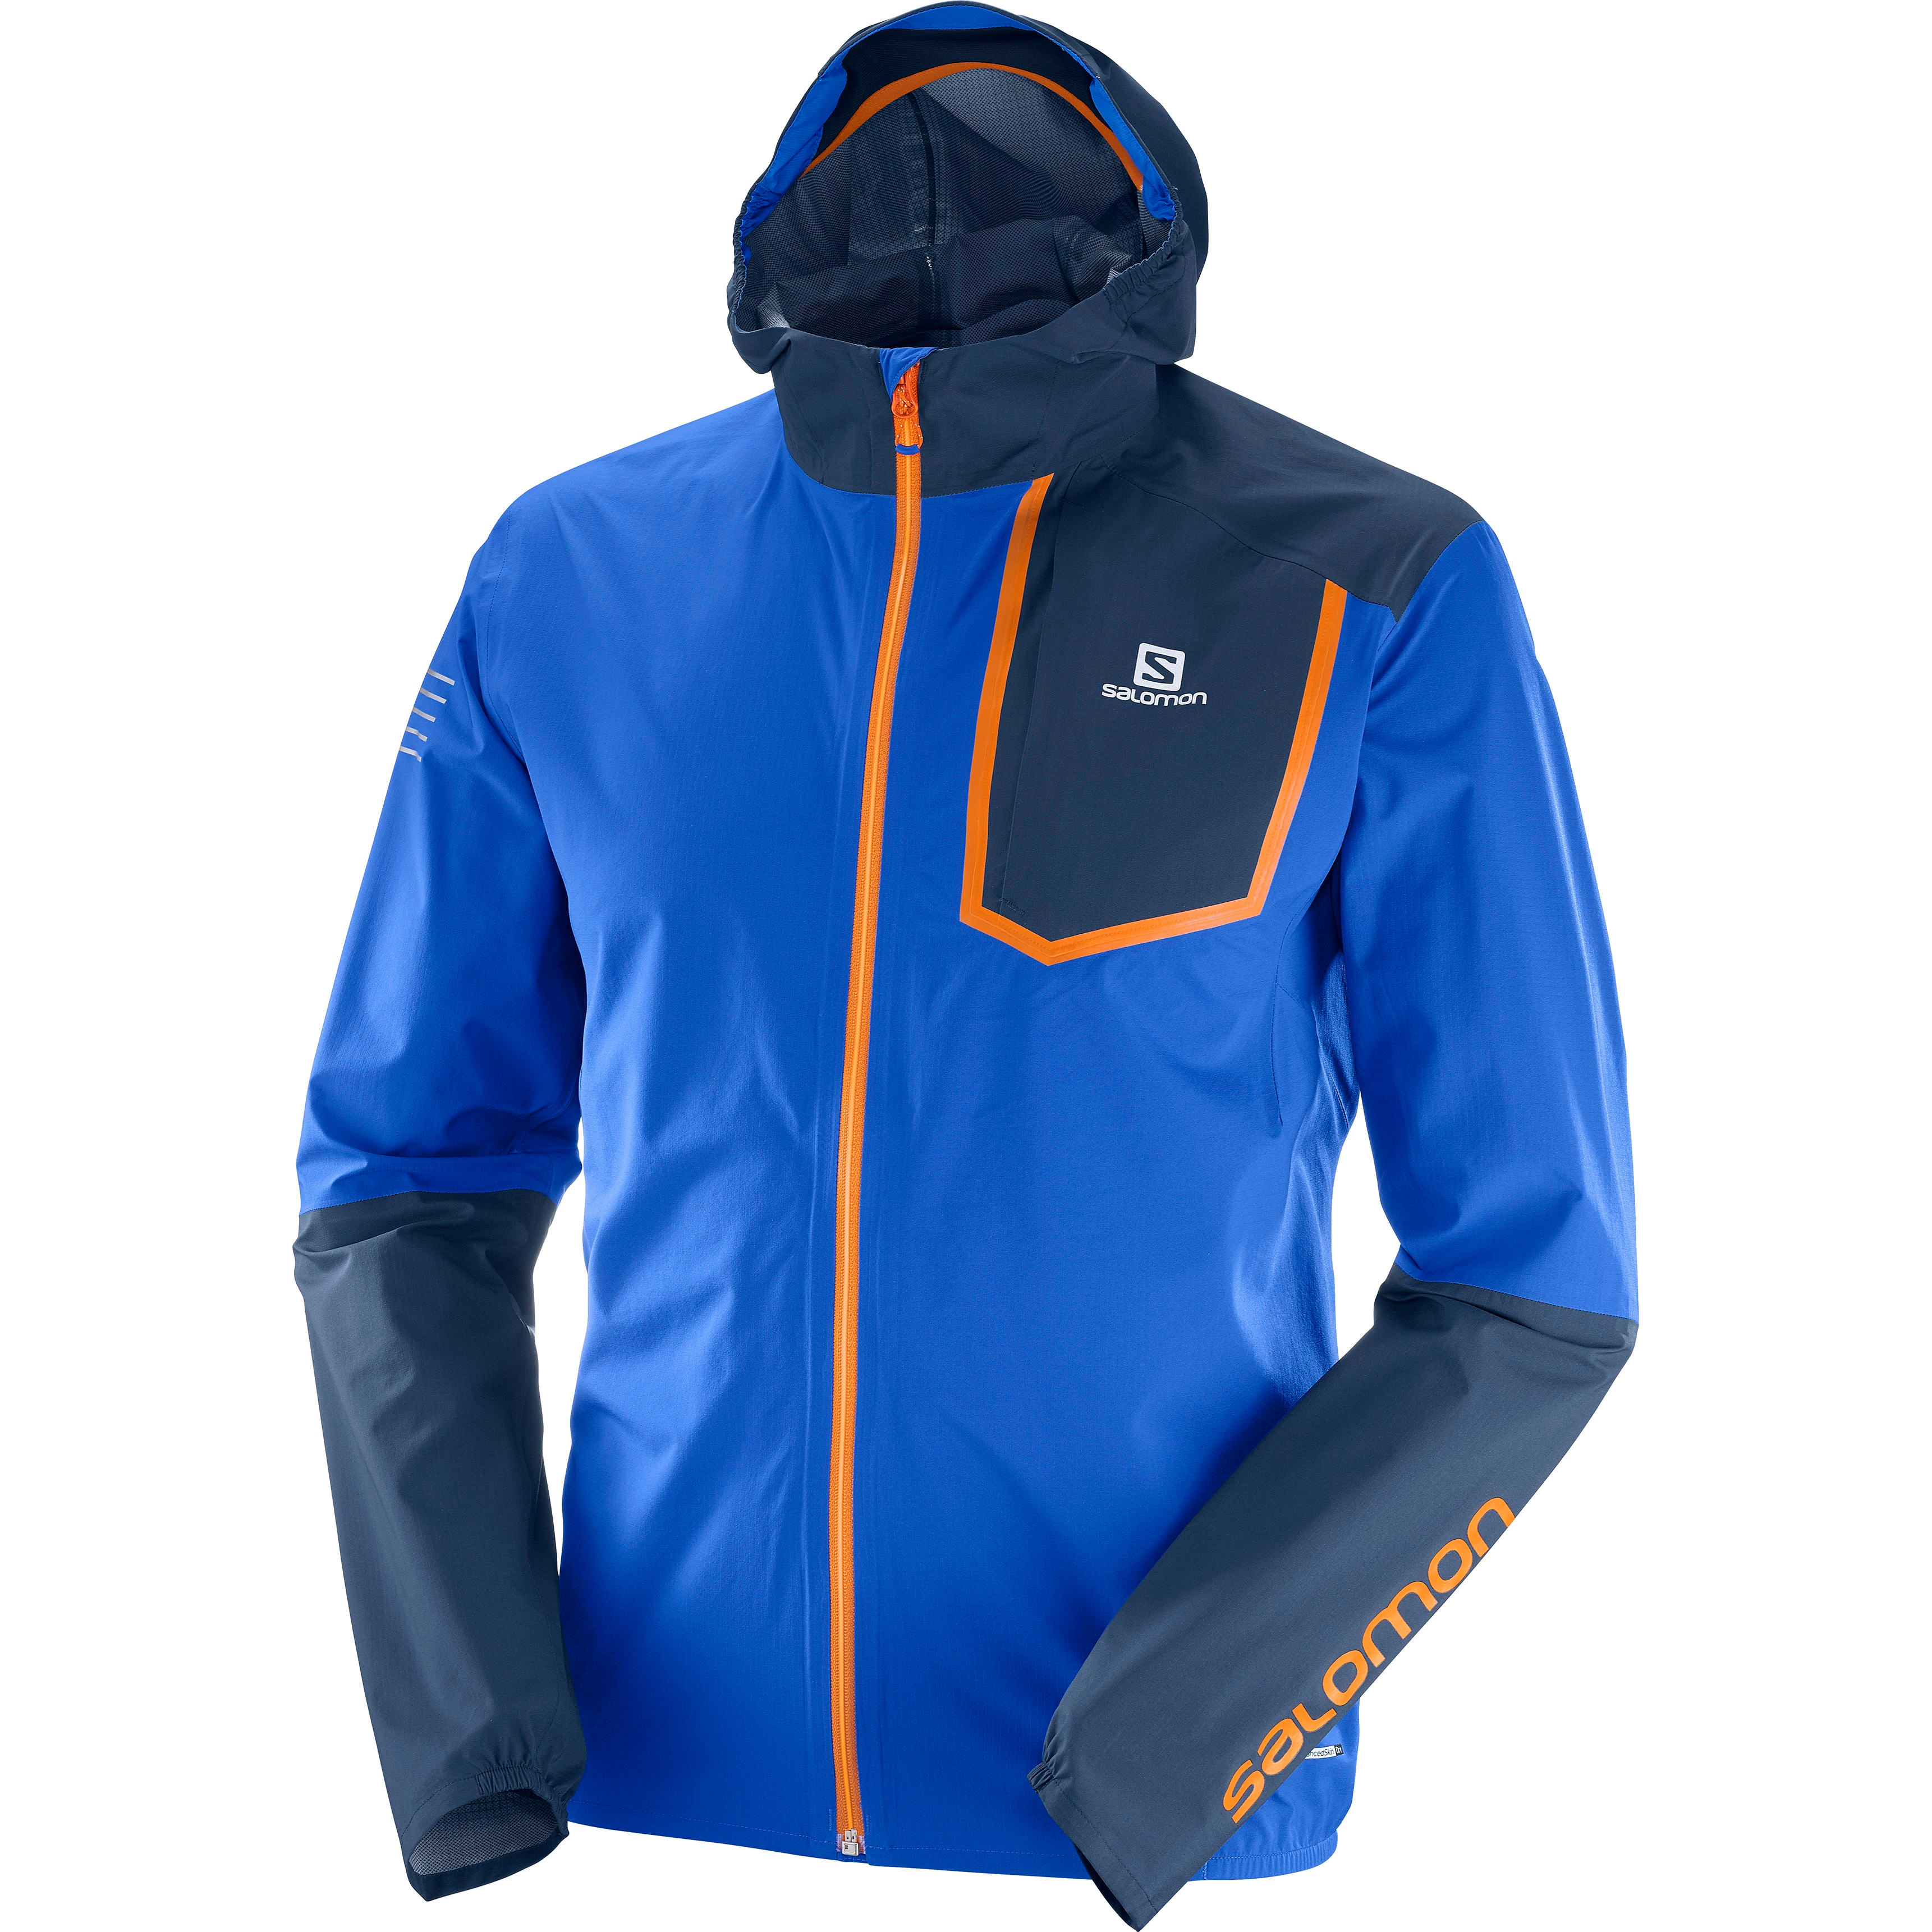 Salomon Bonatti Pro WP Jacket (Herre)